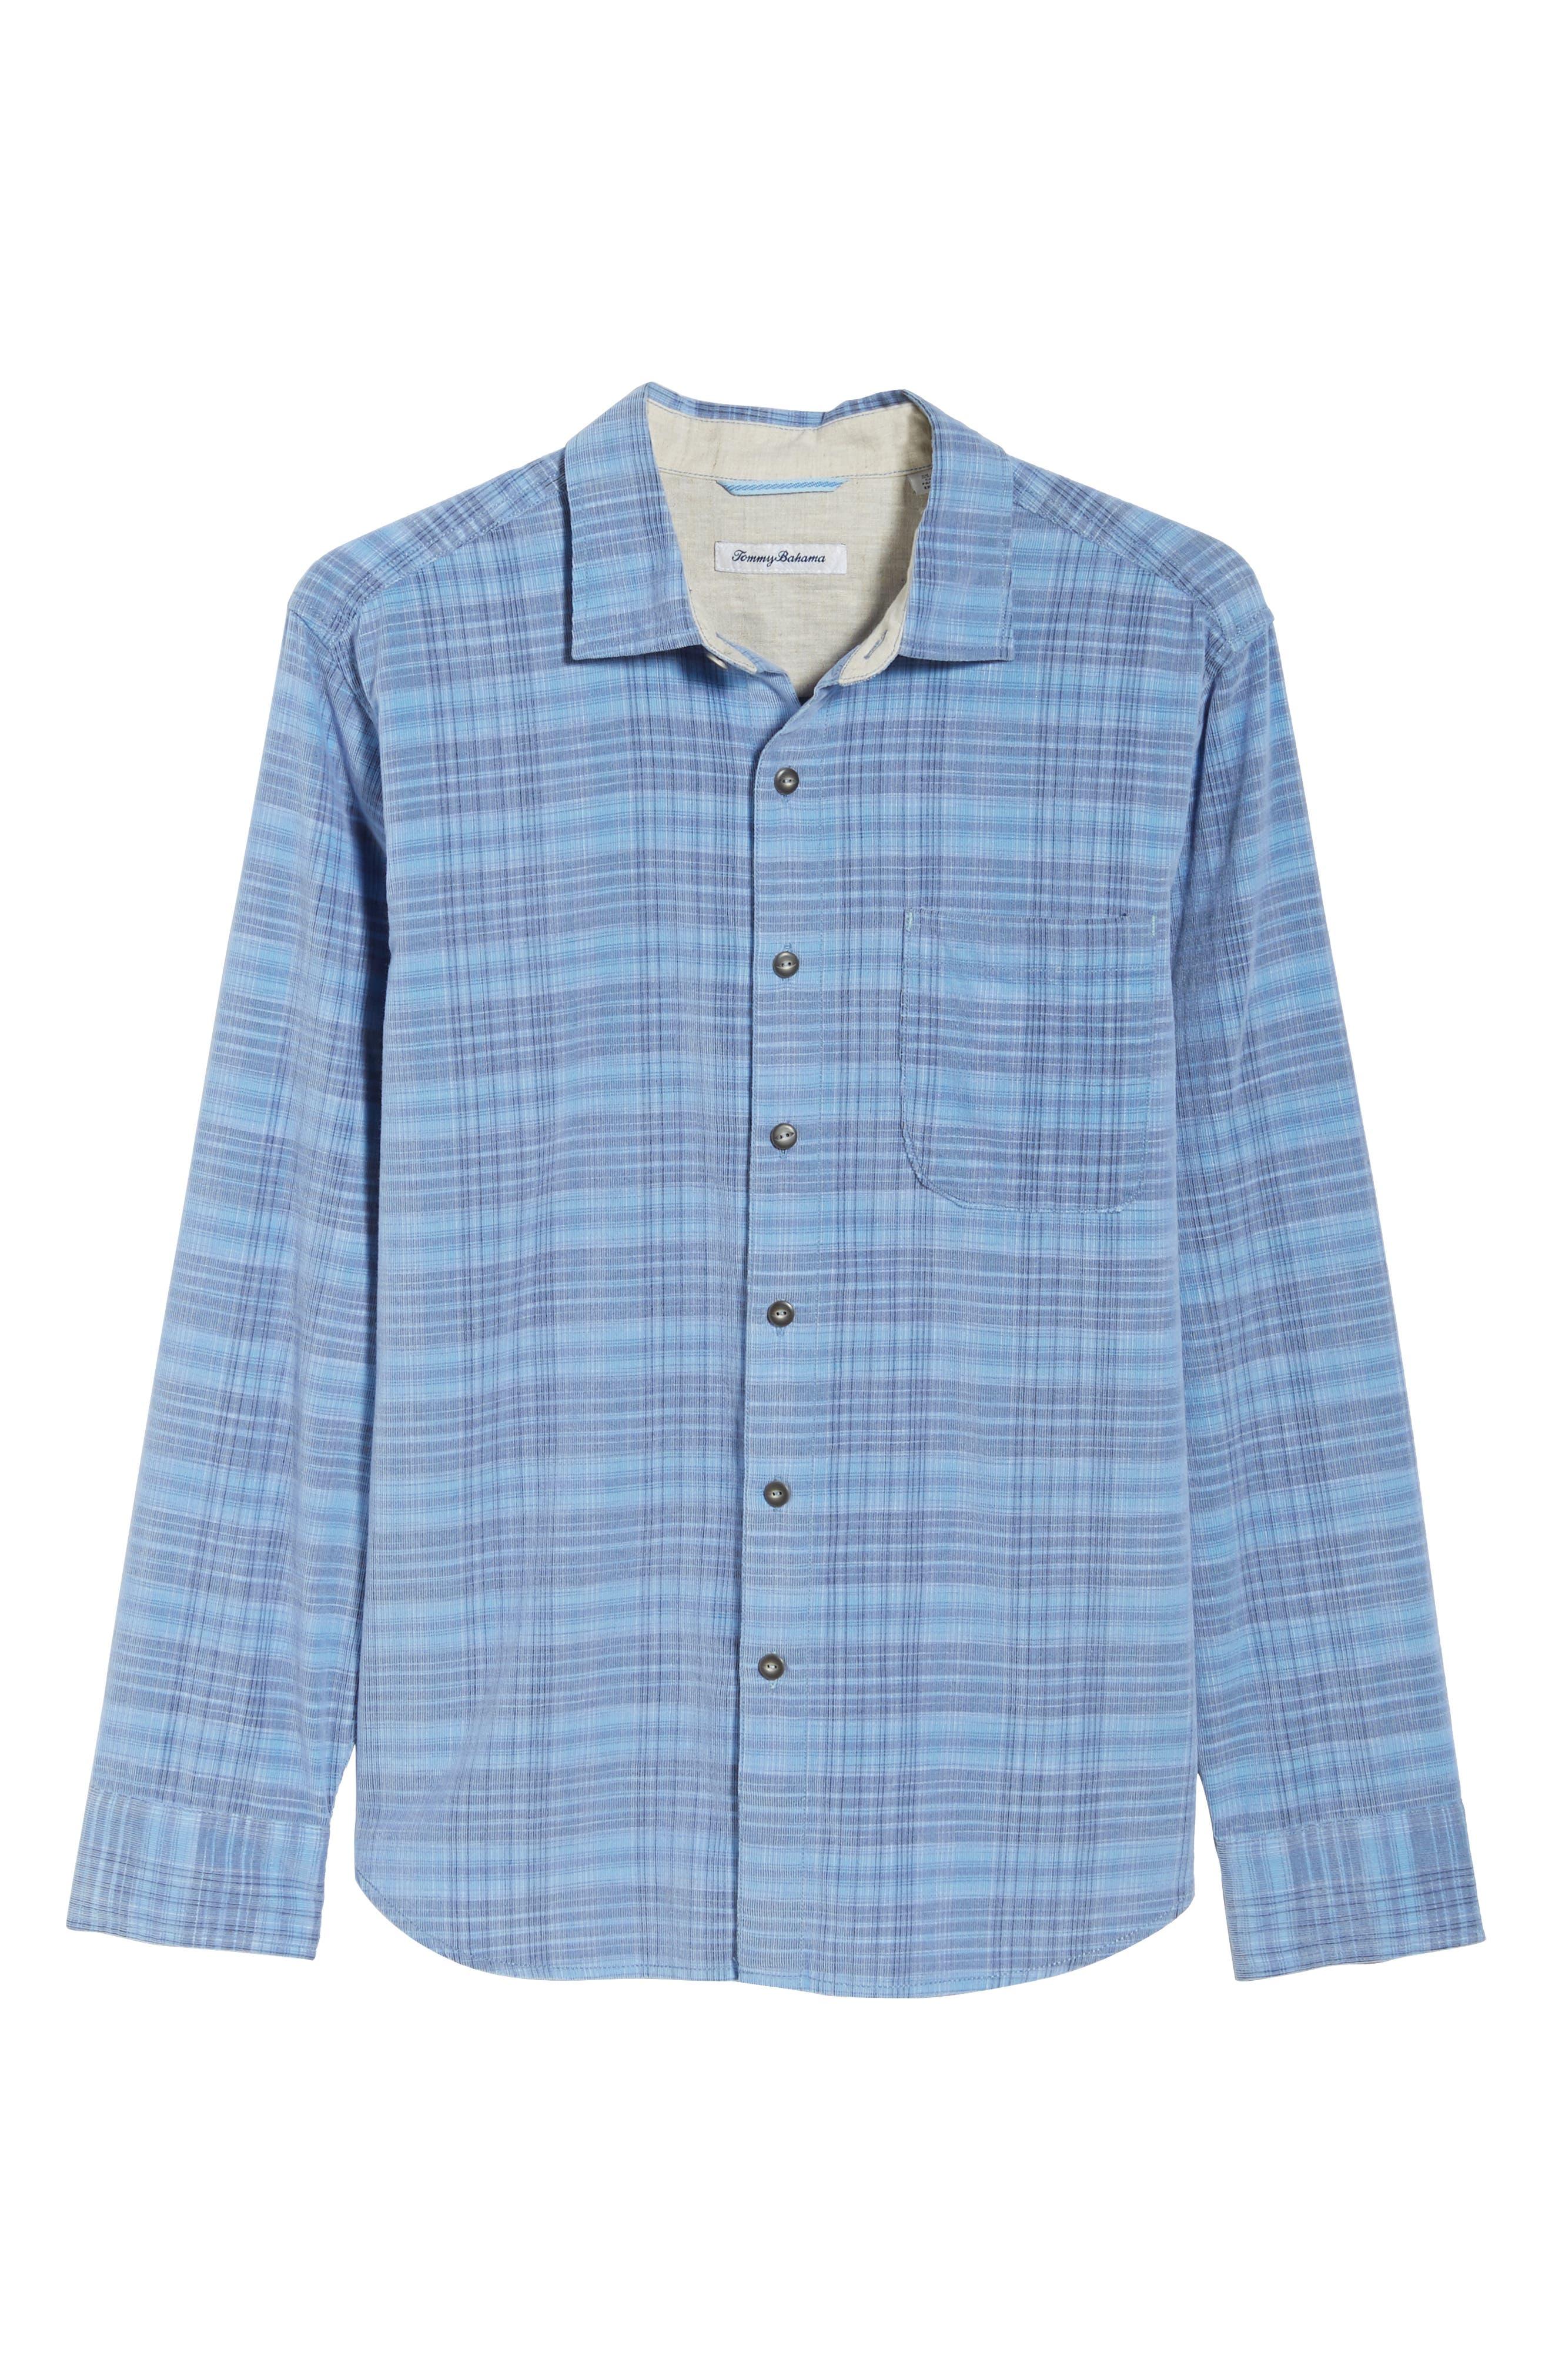 Cruzy Corduroy Shirt,                             Alternate thumbnail 6, color,                             RIVIERA AZURE